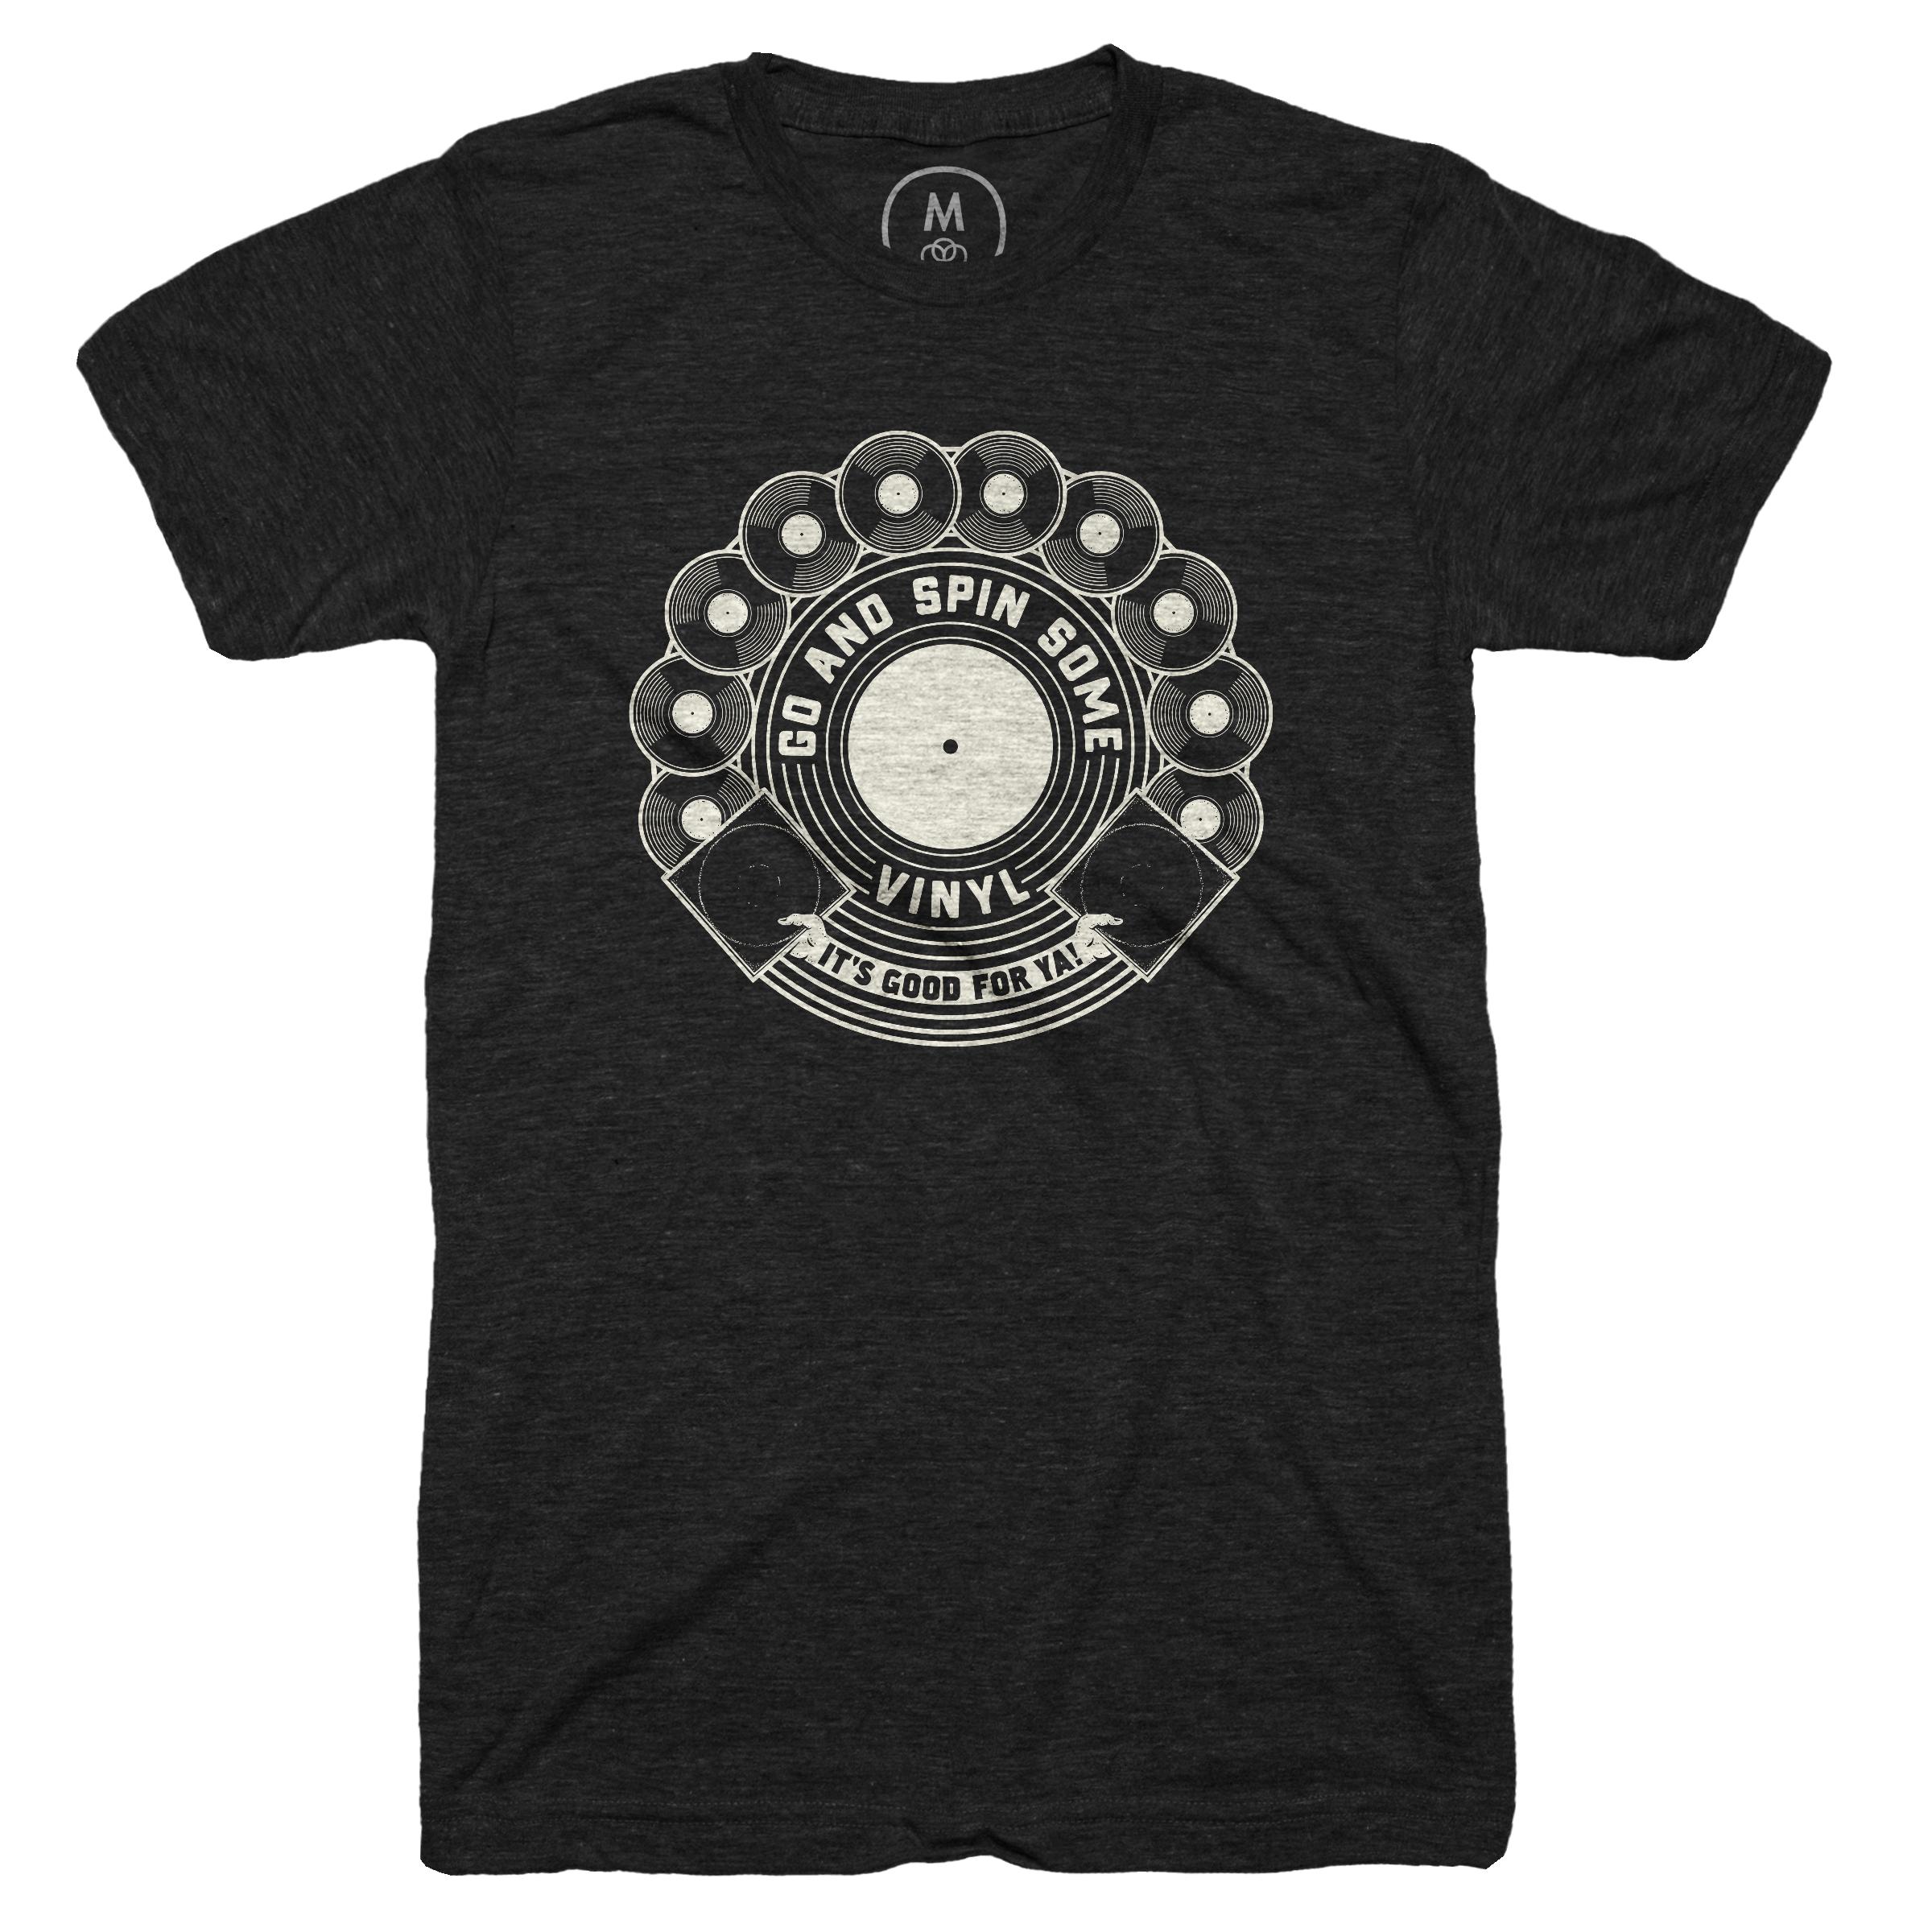 Vinyl's Good For Ya! Vintage Black (Men's)